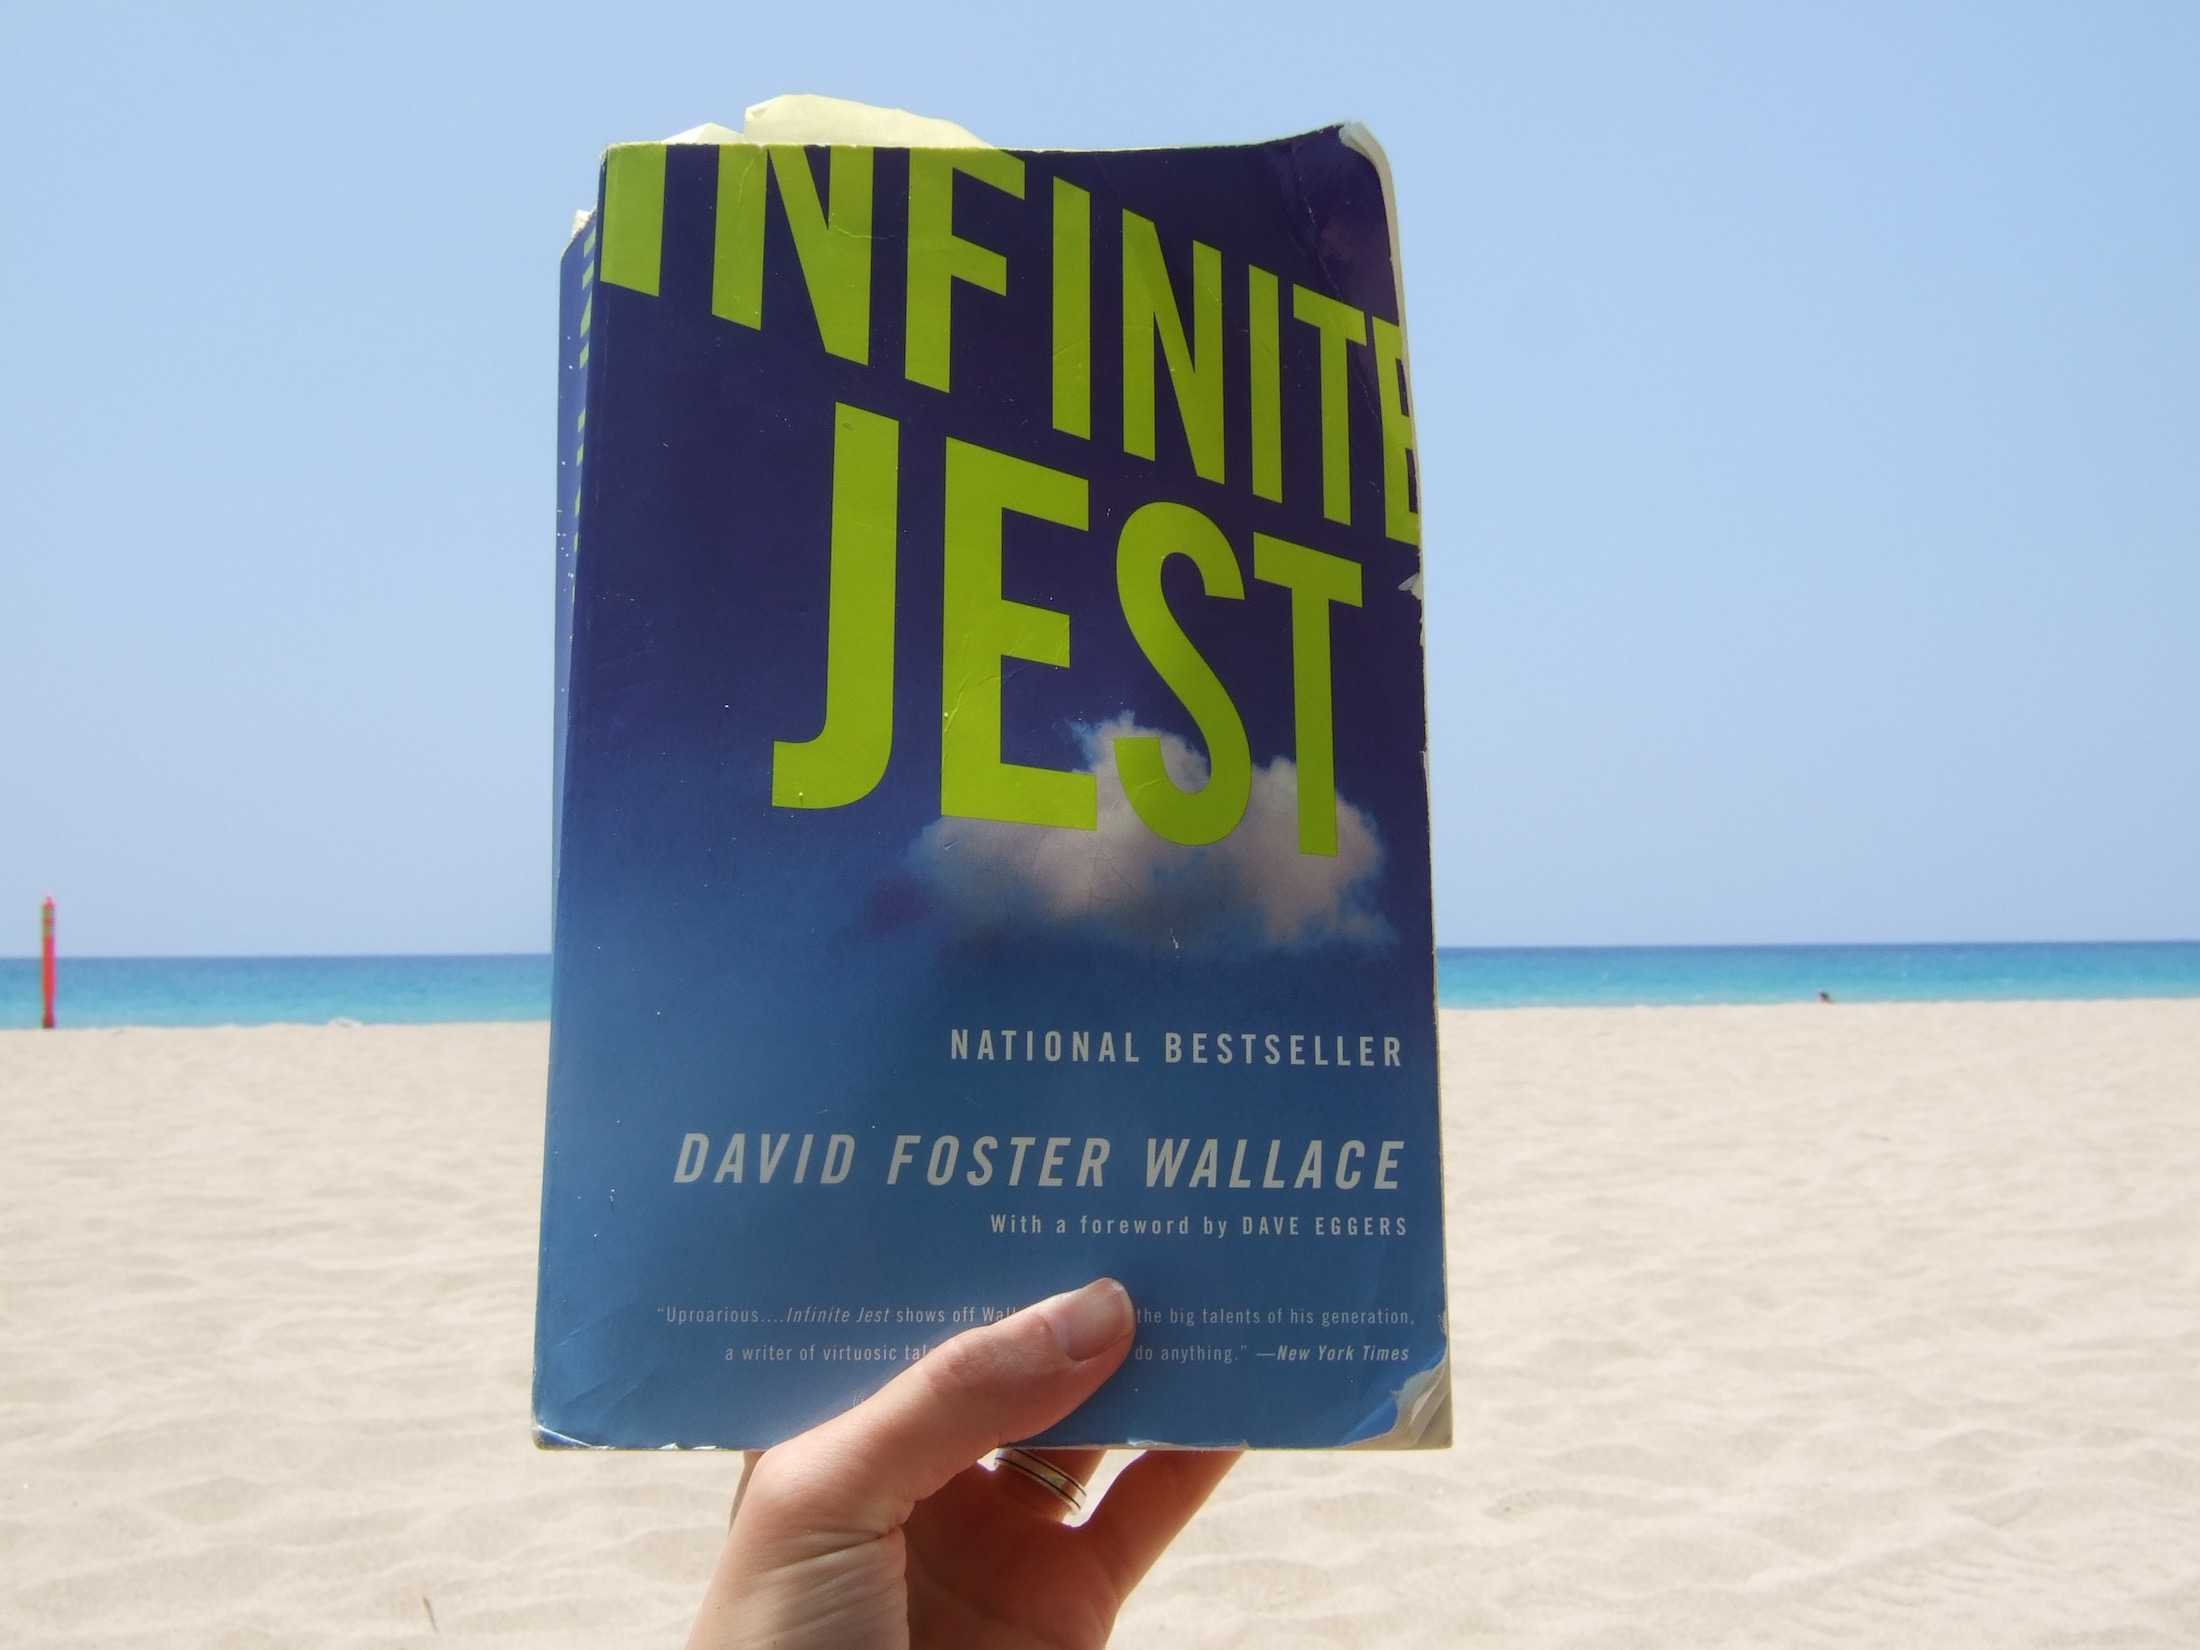 Inifnite beach